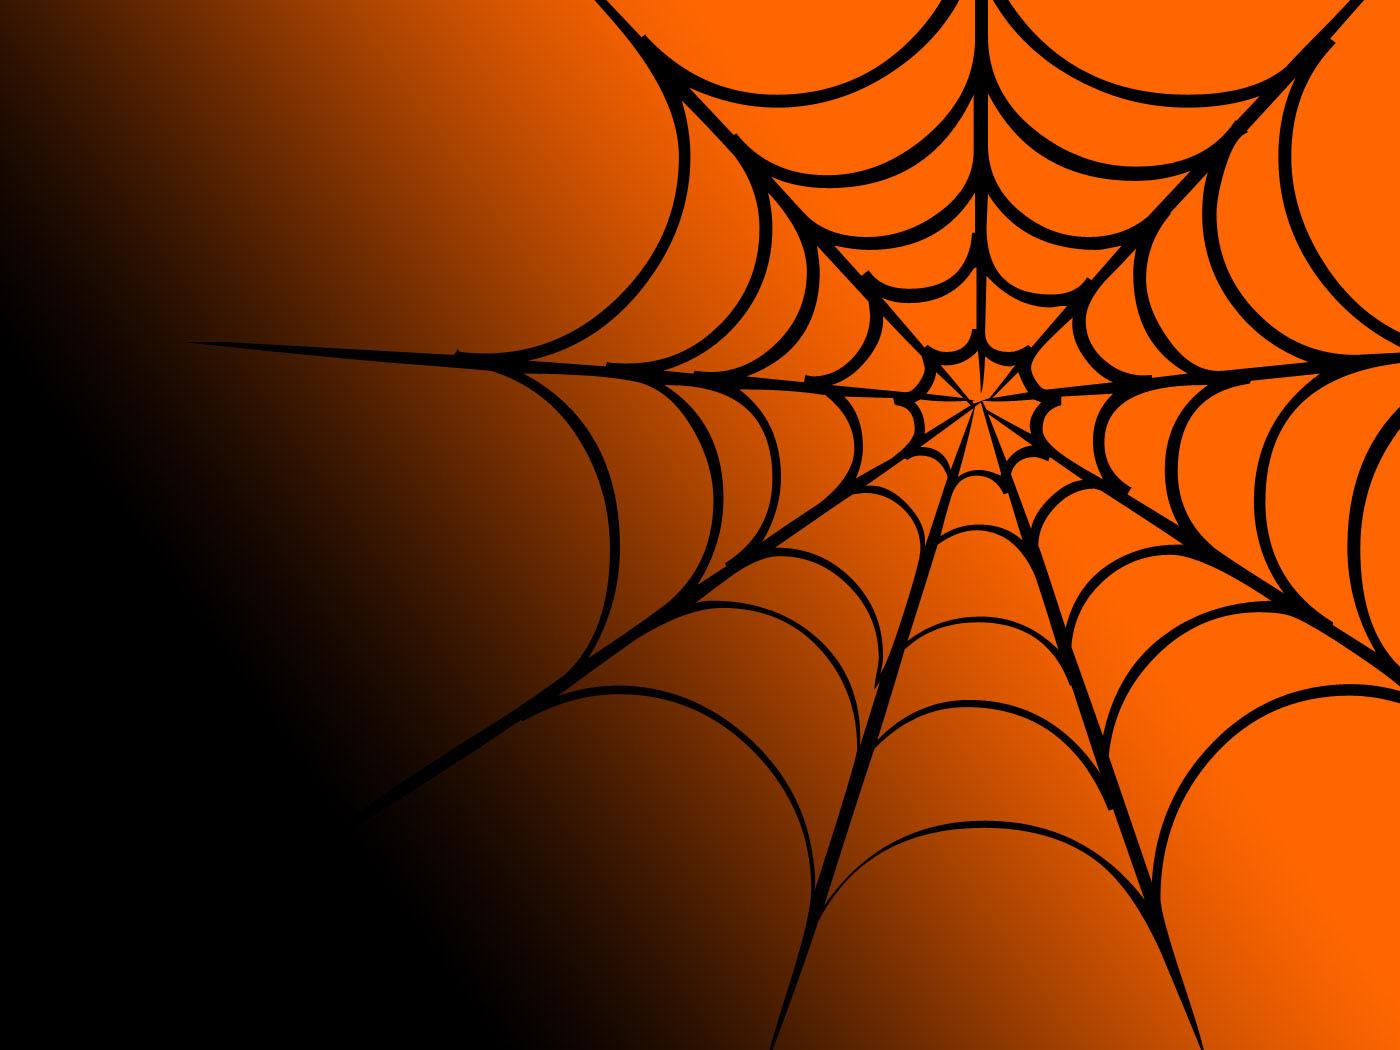 halloween orange and black wallpaper - photo #14